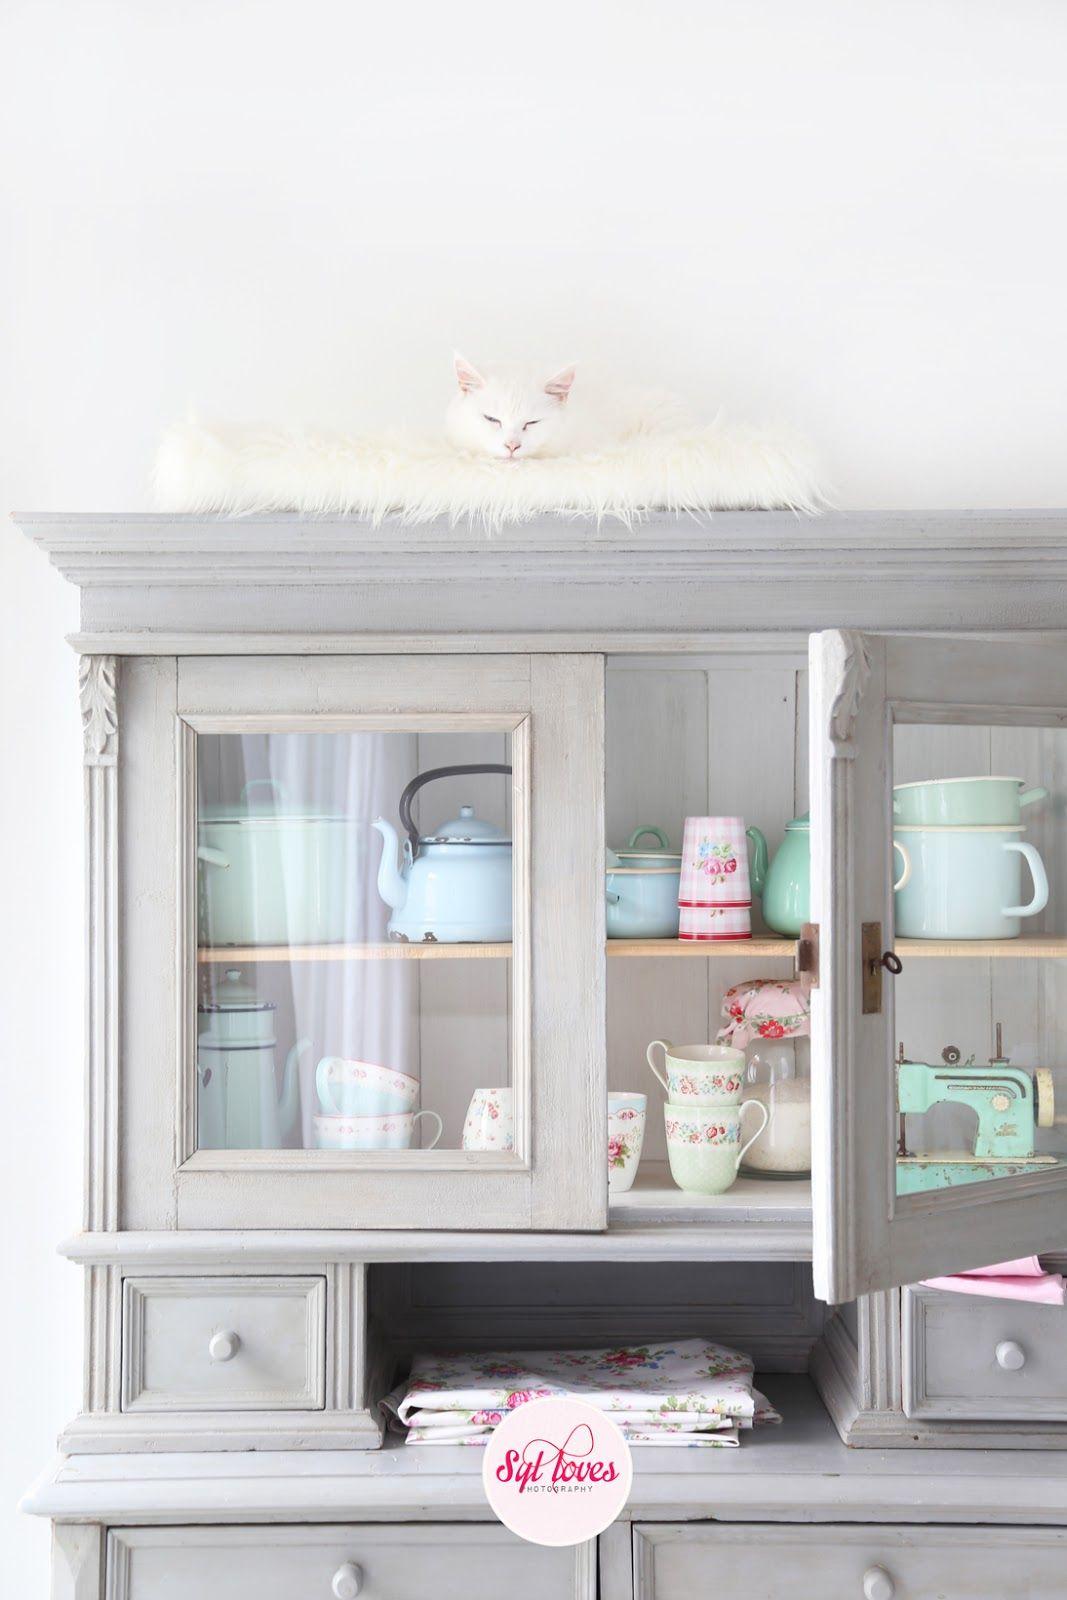 Syl loves, kitchen, vintage, mr.Blue, GreenGate | Kitchen ...